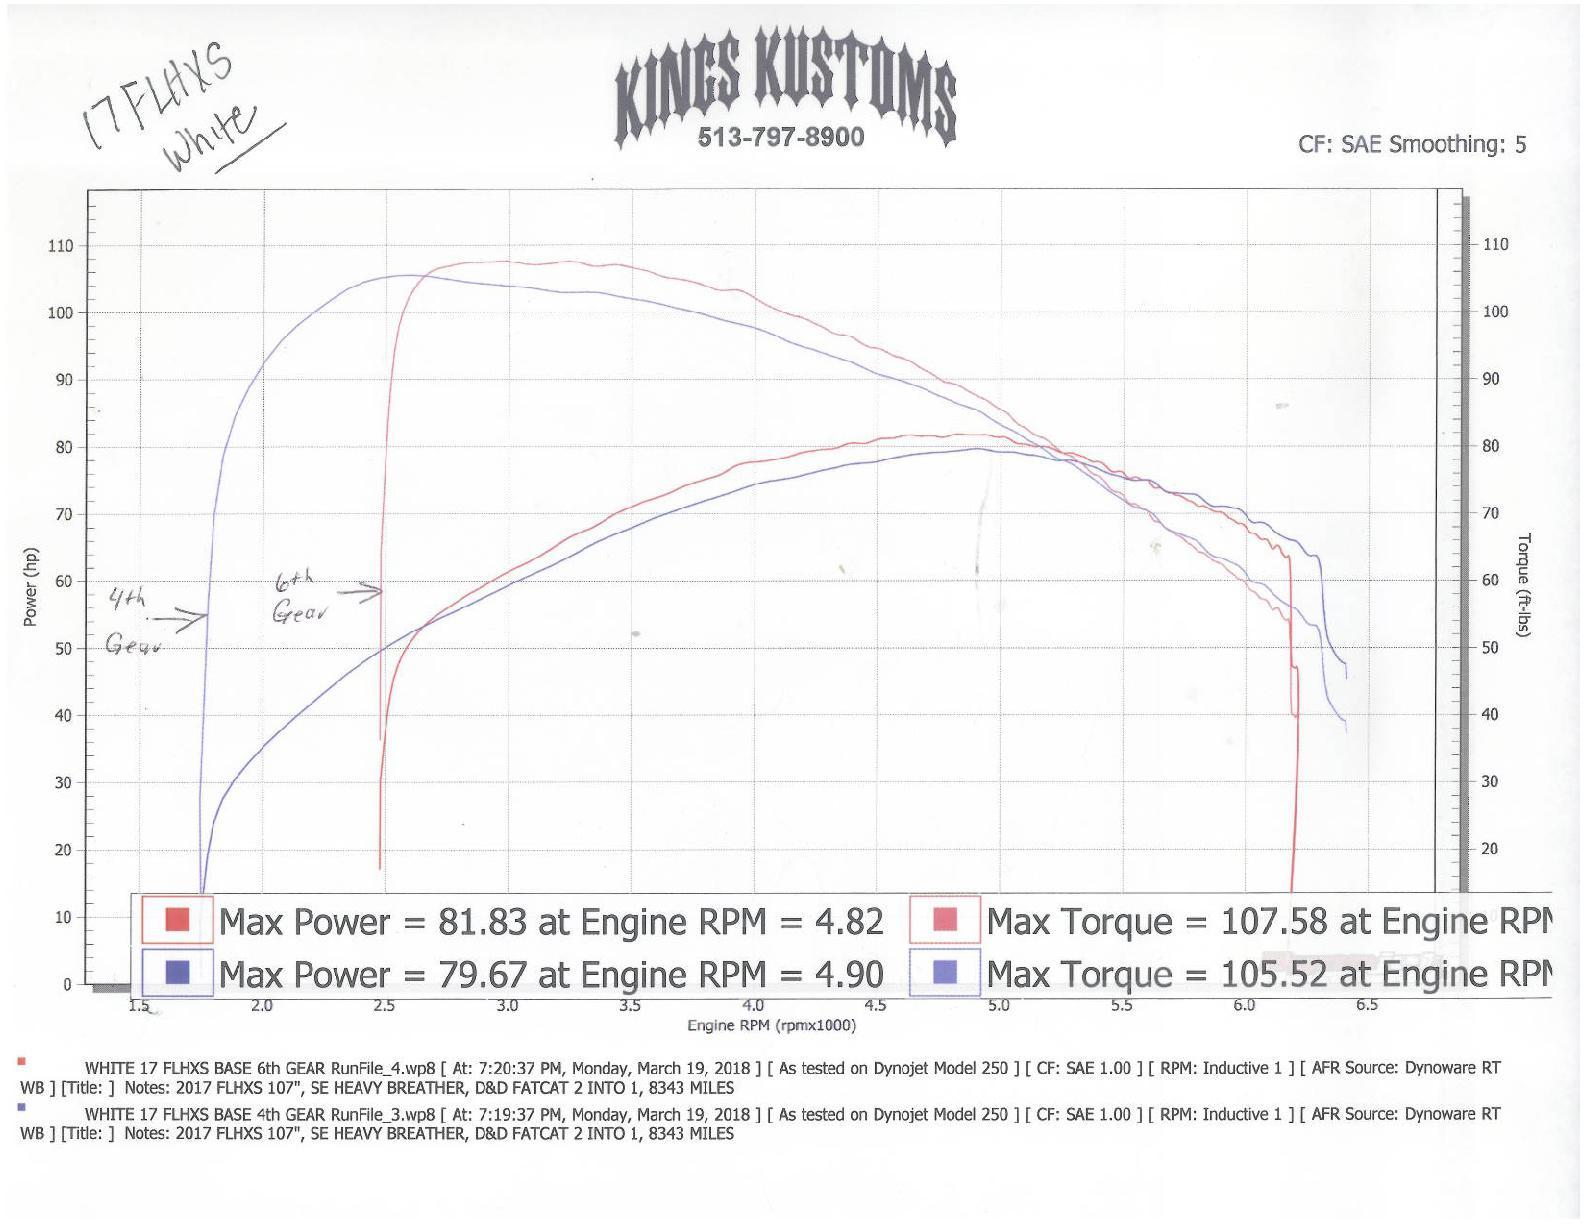 2017 Harley Davidson Flhxs For Sale In Batavia Oh Kings Kustoms Cruise Control Diagram 1 13